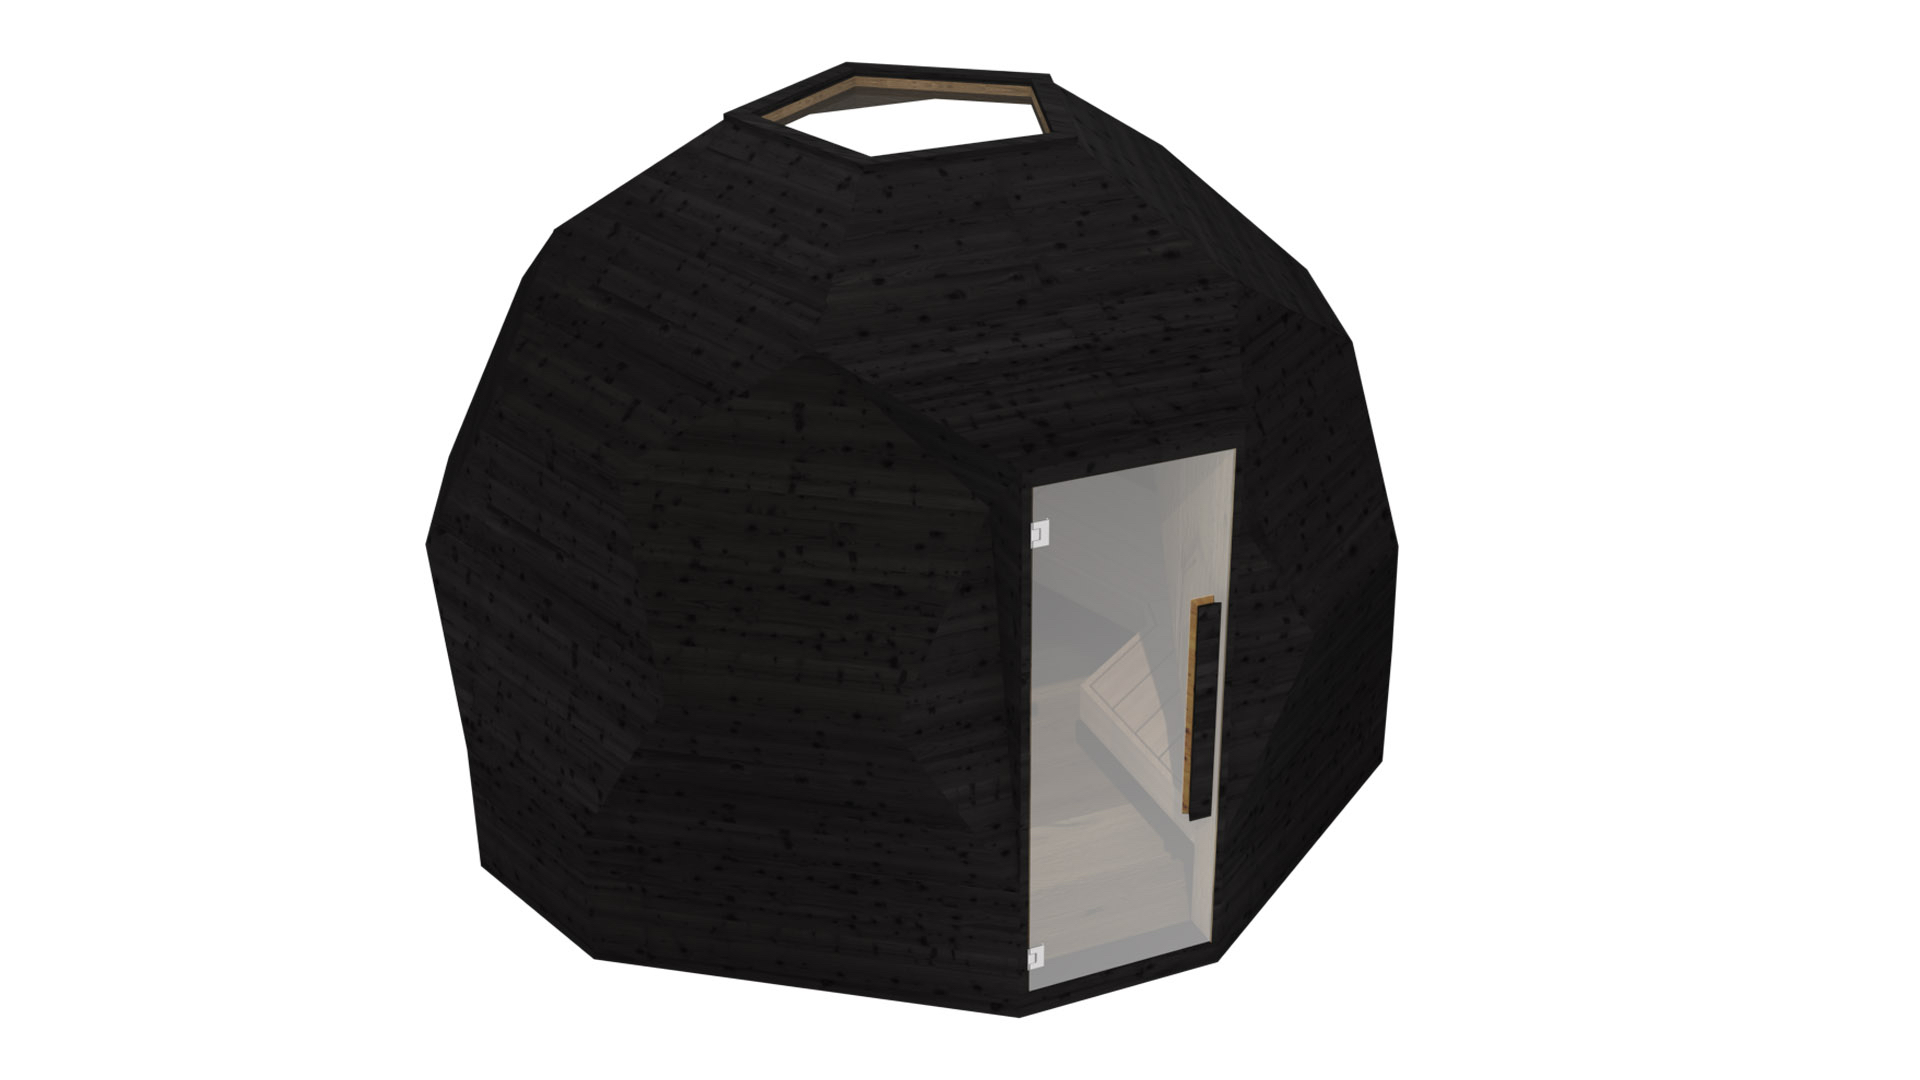 INUA Odin Geodatisk udendoers finsk sauna2